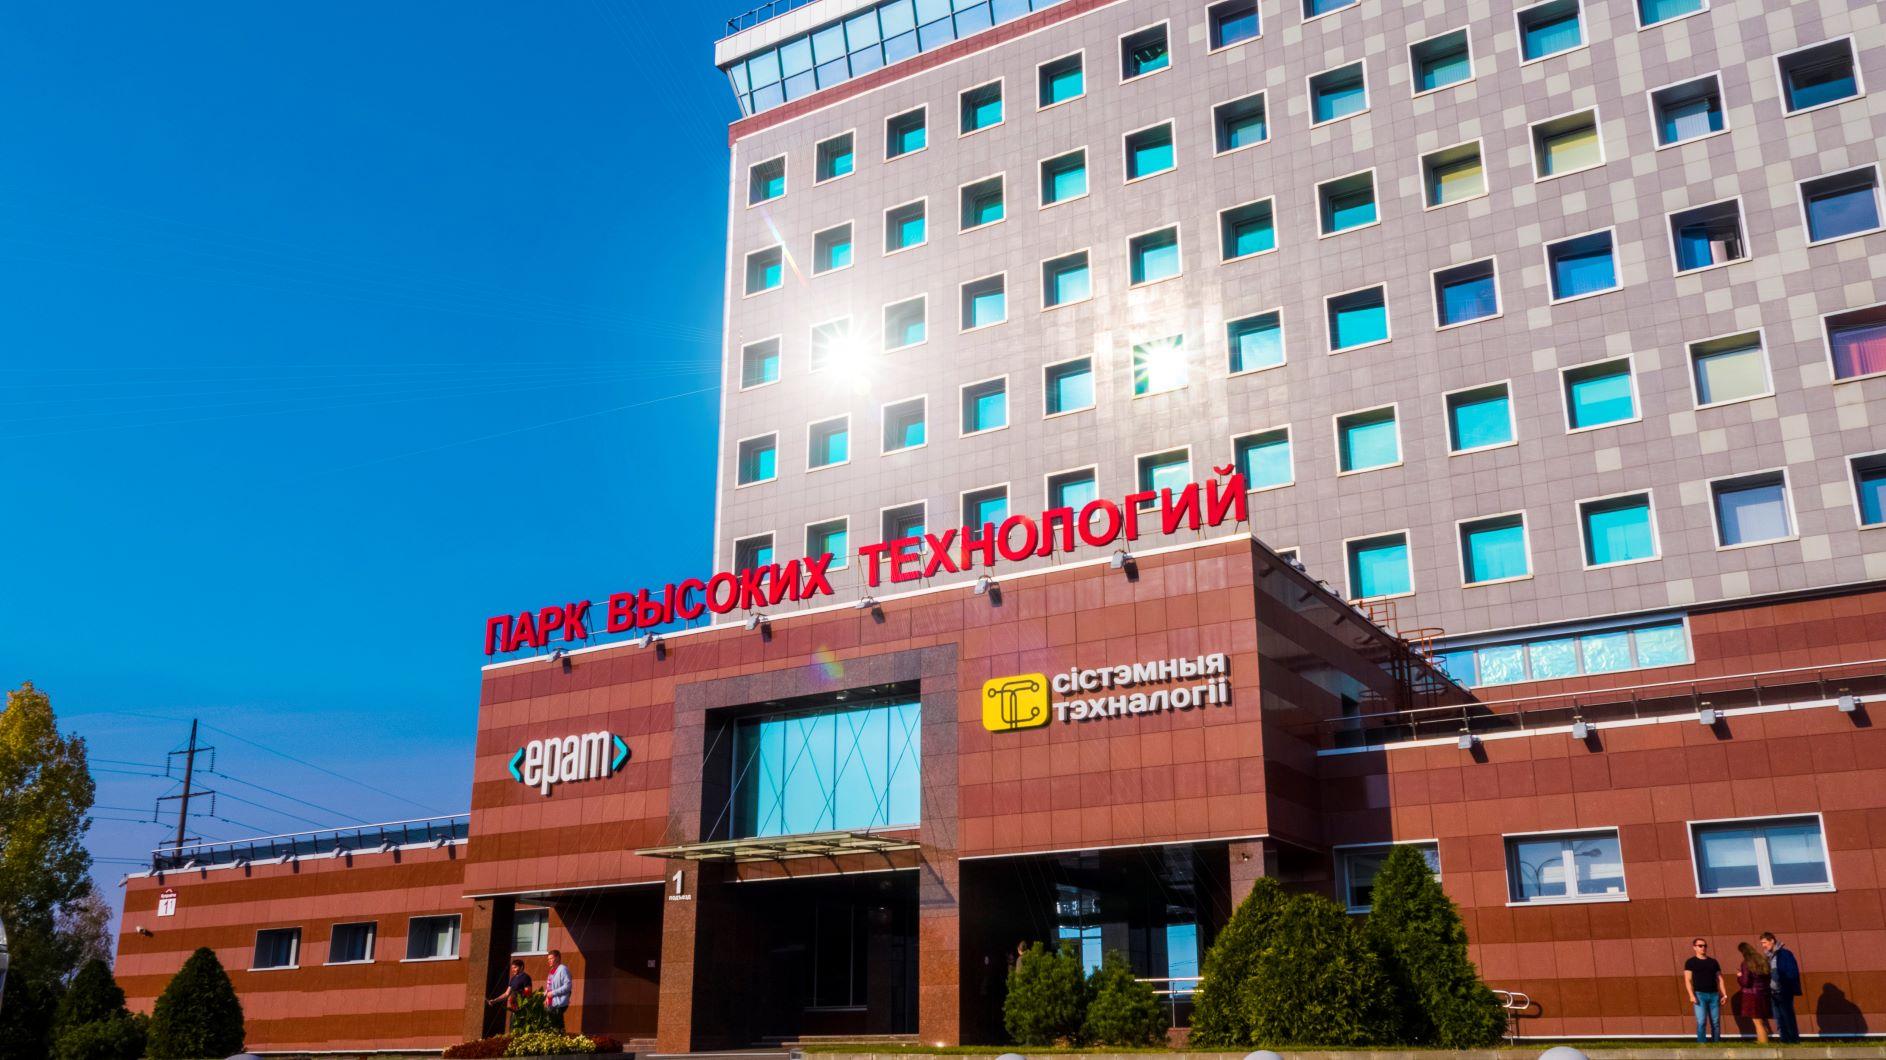 Белорусский парк высоких технологий. Фото: park.by